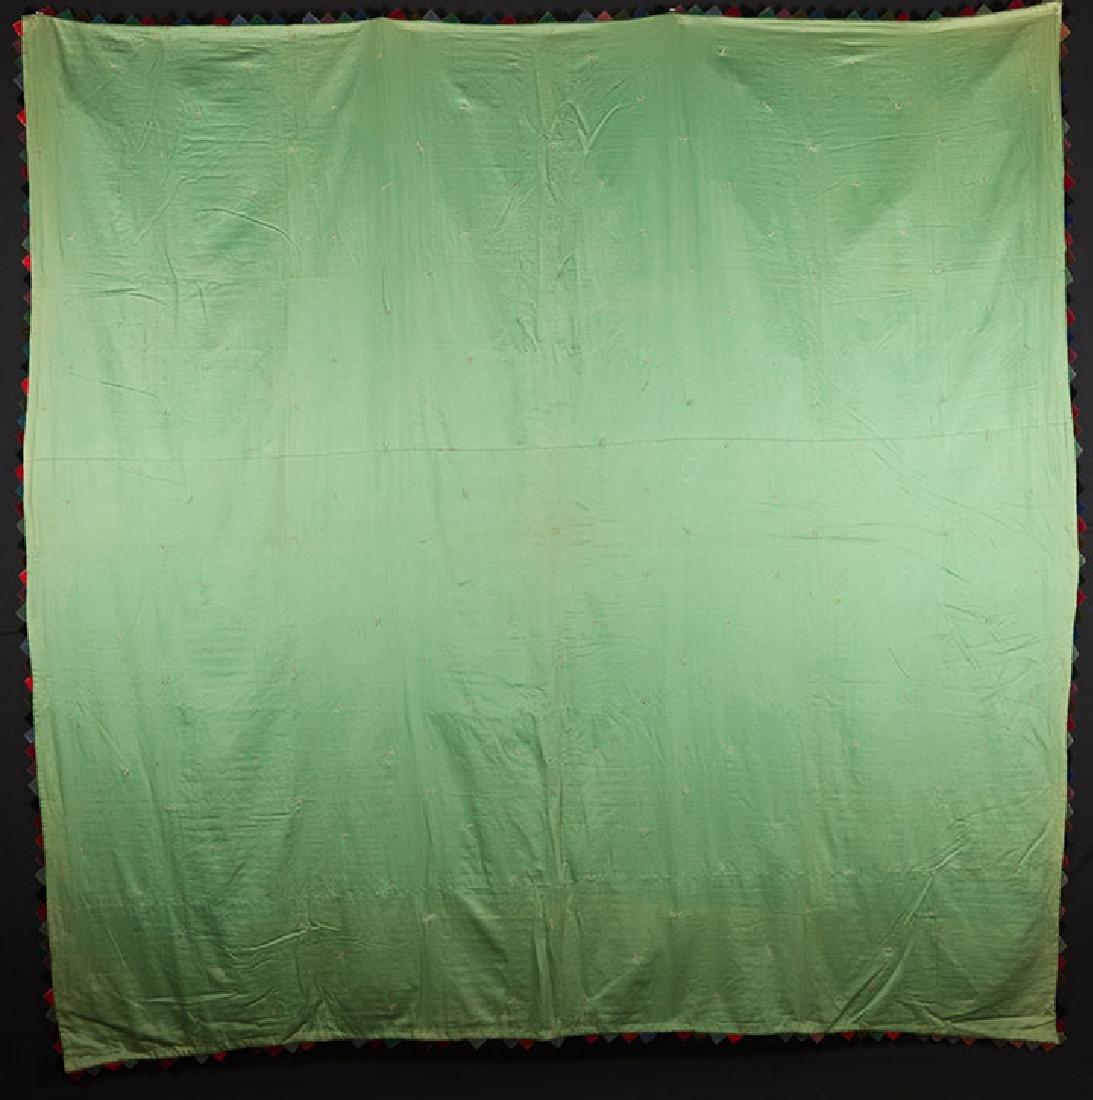 LOG CABIN QUILT, 1880-1900 - 8